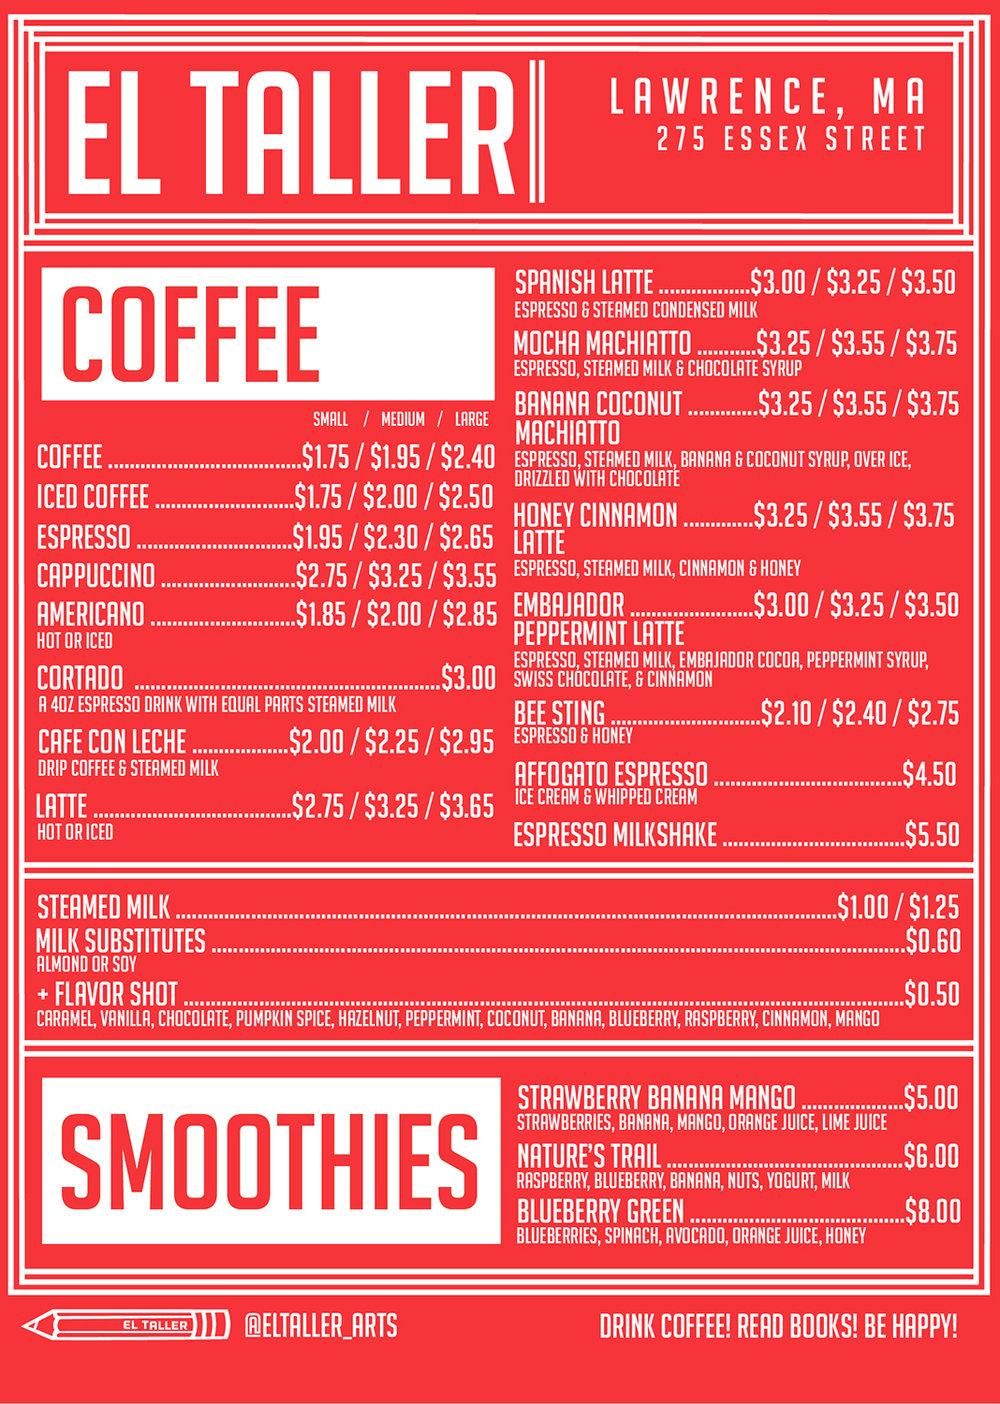 eltaller_beverage_menu2.2.jpg